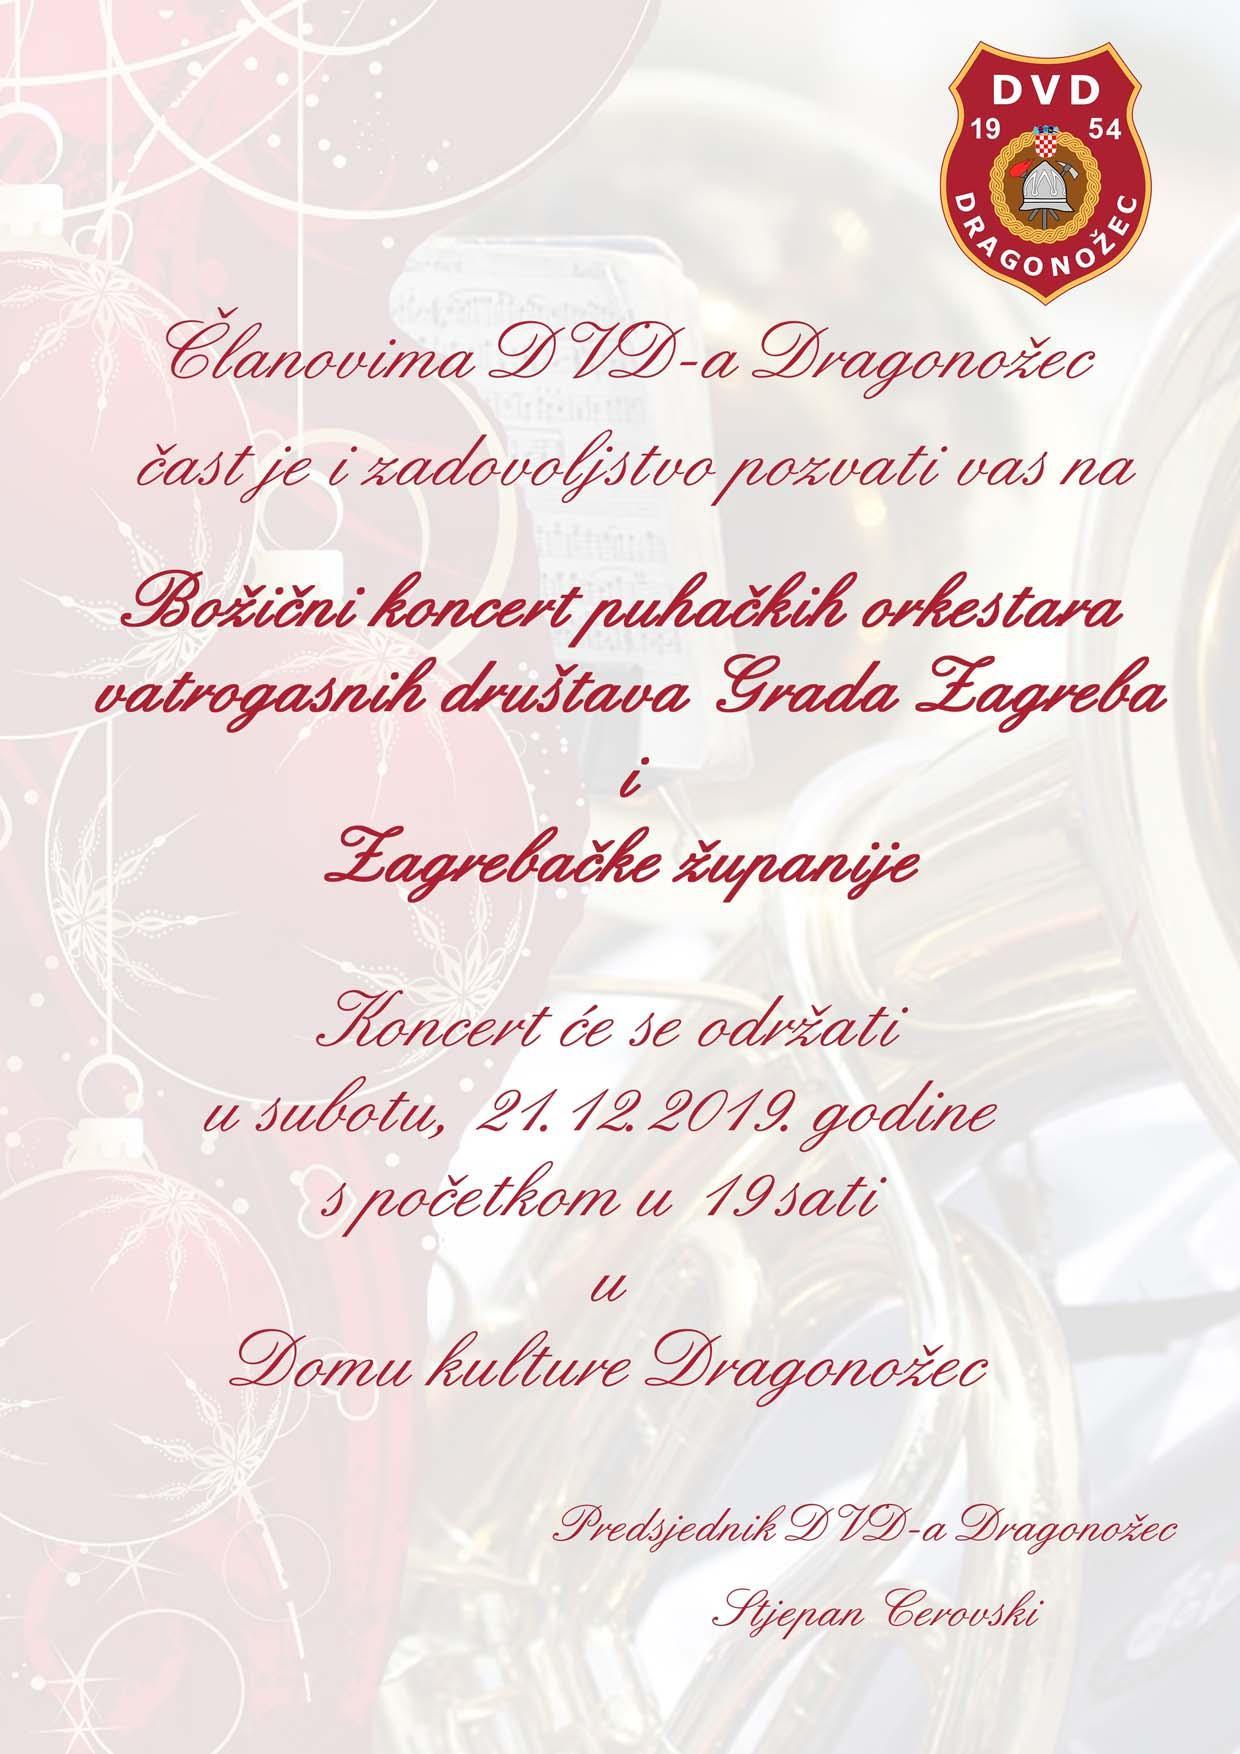 PozivnicaZaBozicniKoncert_01-page-001